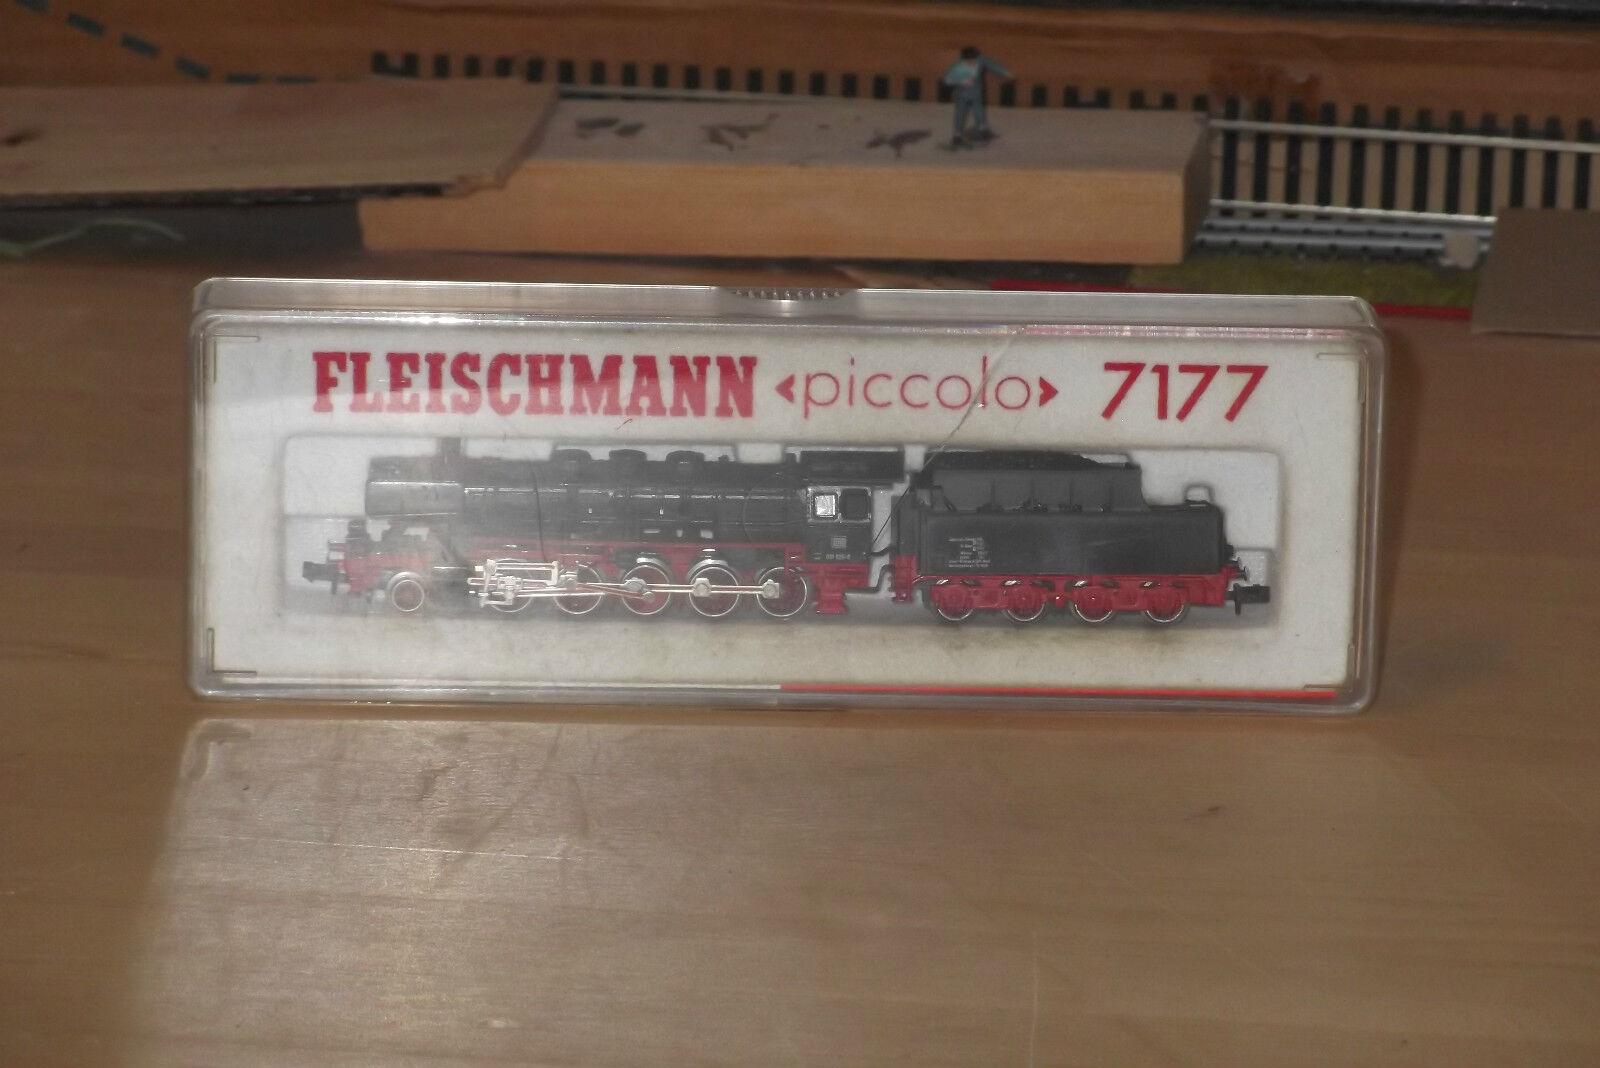 FLEISCHMANN piccolo 7177   2-10-0 2-10-0 2-10-0 Heavy Loco d0ff53